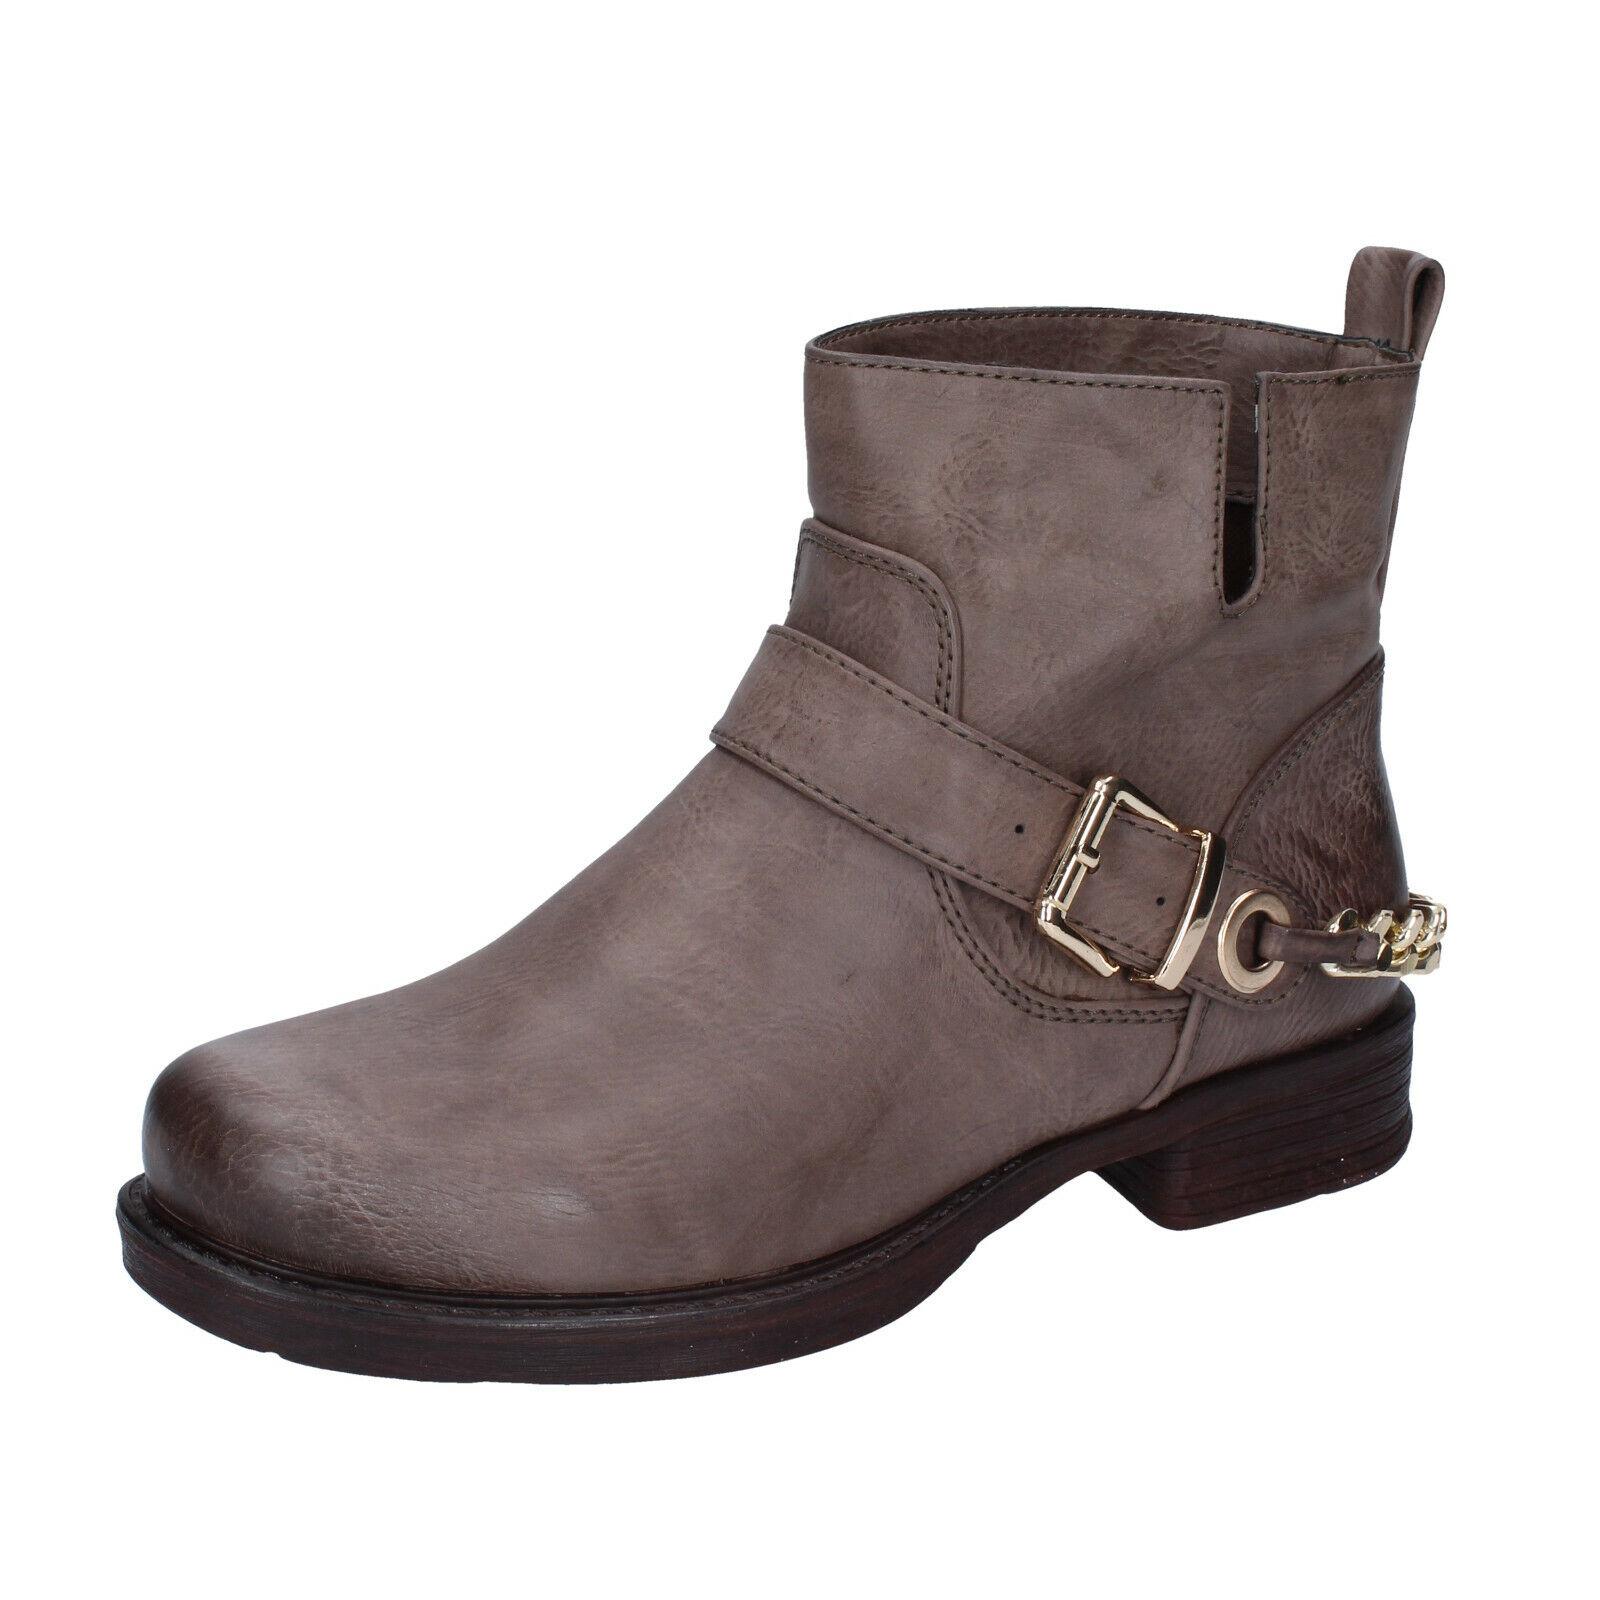 Femme chaussures francesco milano 4 (ue 37) bottines en cuir marron AJ227-D